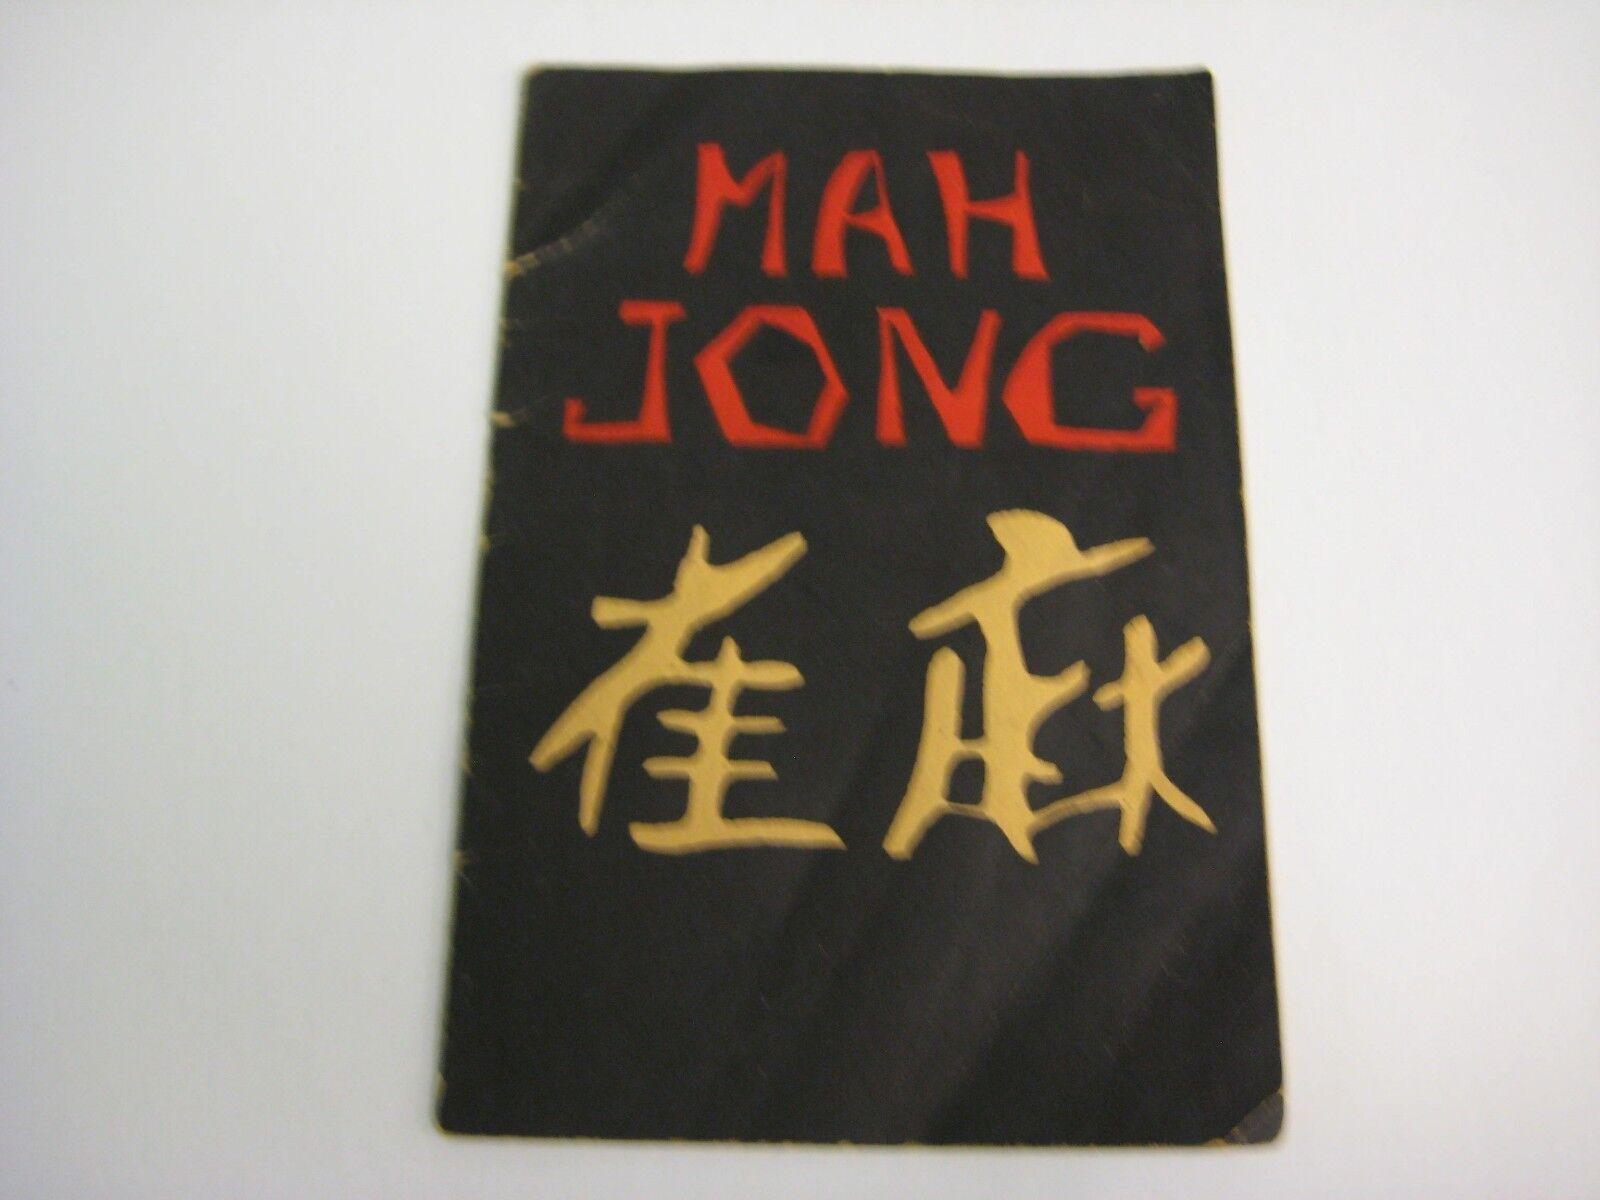 Mah - jong - buch etwa early-mid 1920 von botwen ptg.co., n.y.